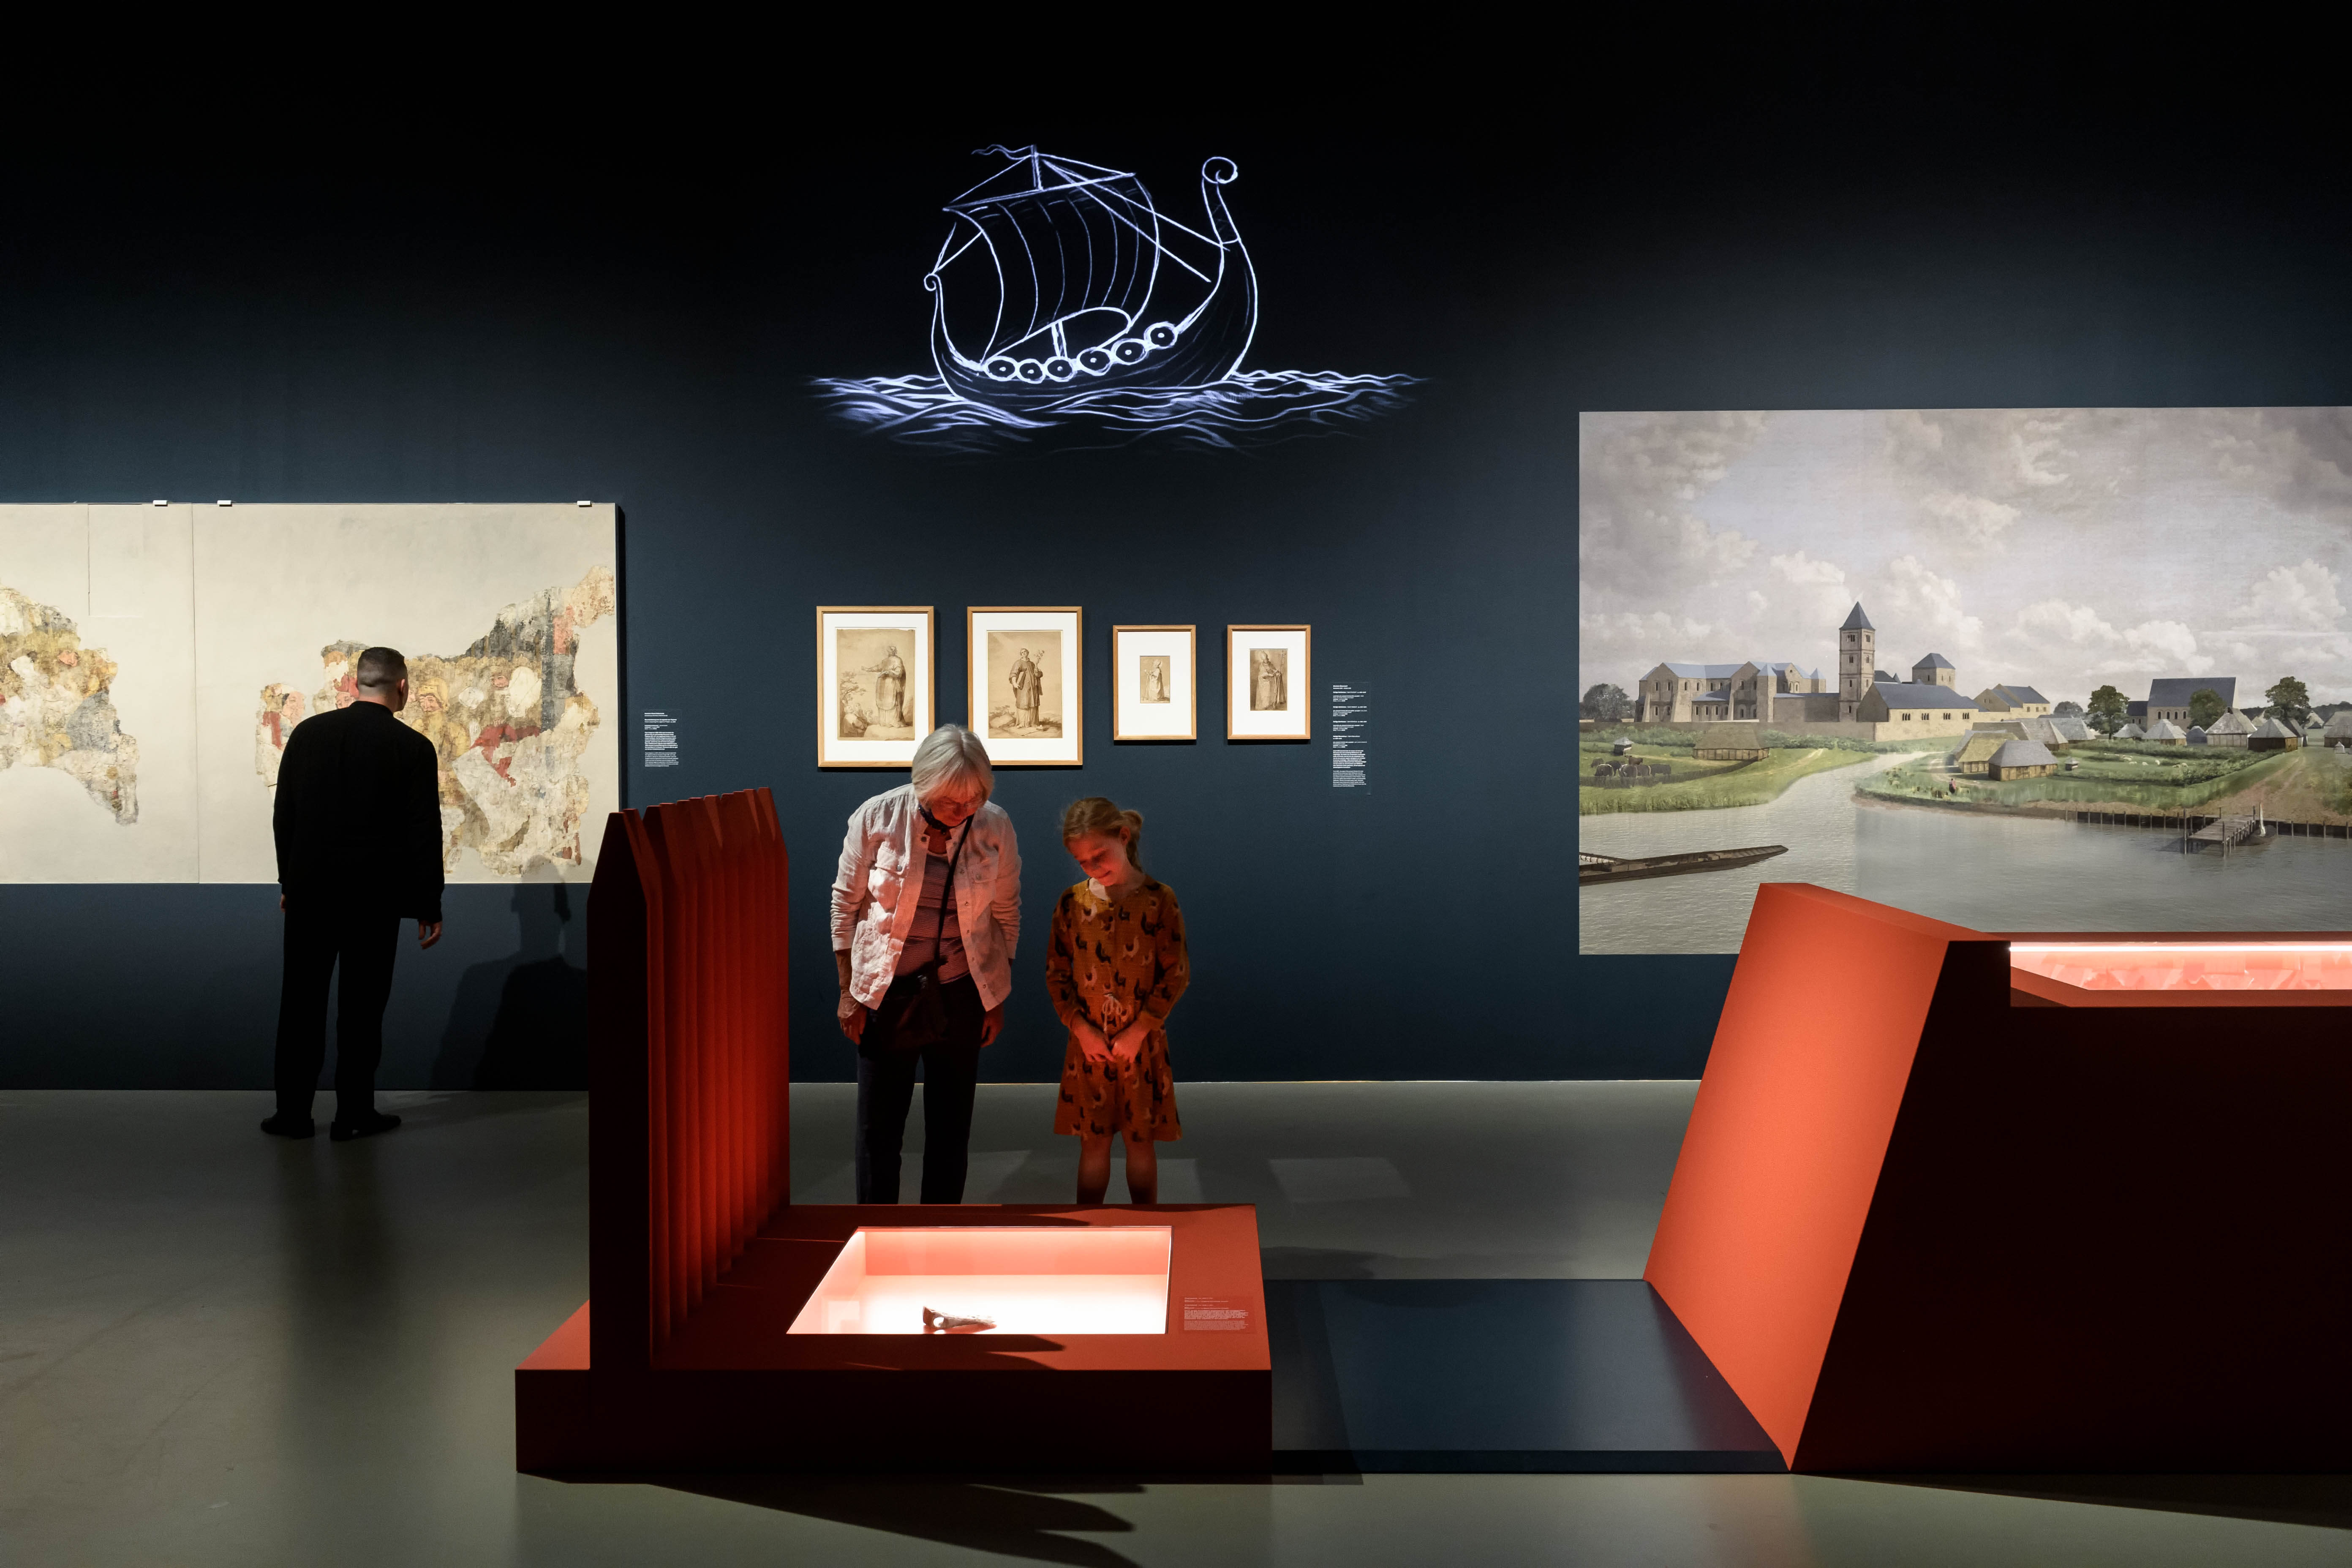 tentoonstelling de ommuurde stad centraal museum 1 4 jpg